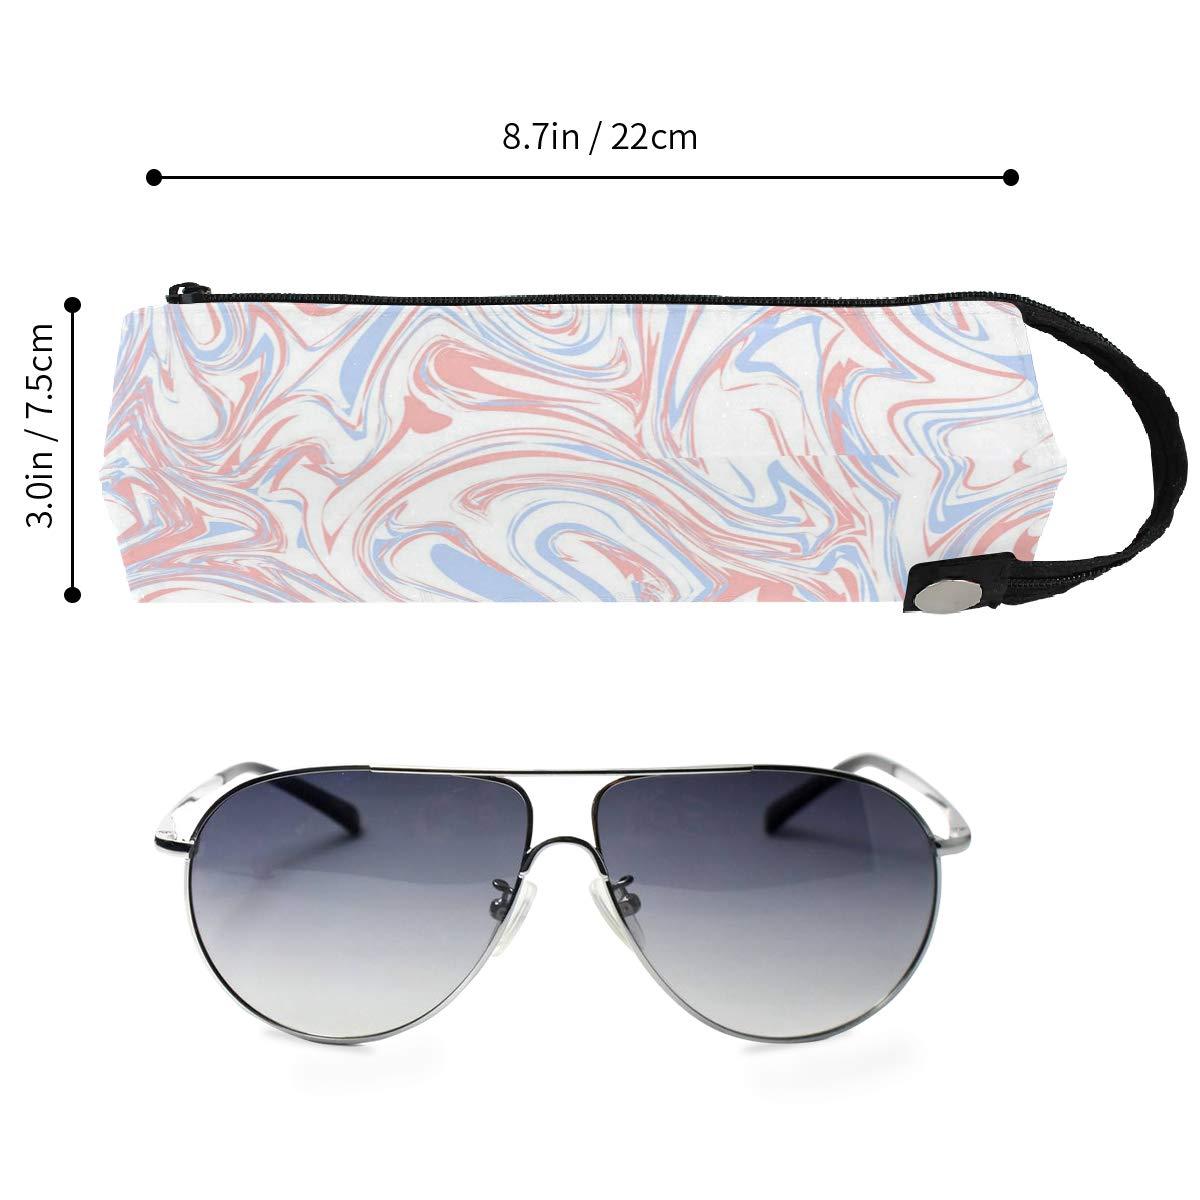 Glasses Case Hipster Marble Texture Portable Soft Sunglasses Pen Bag Protective Box